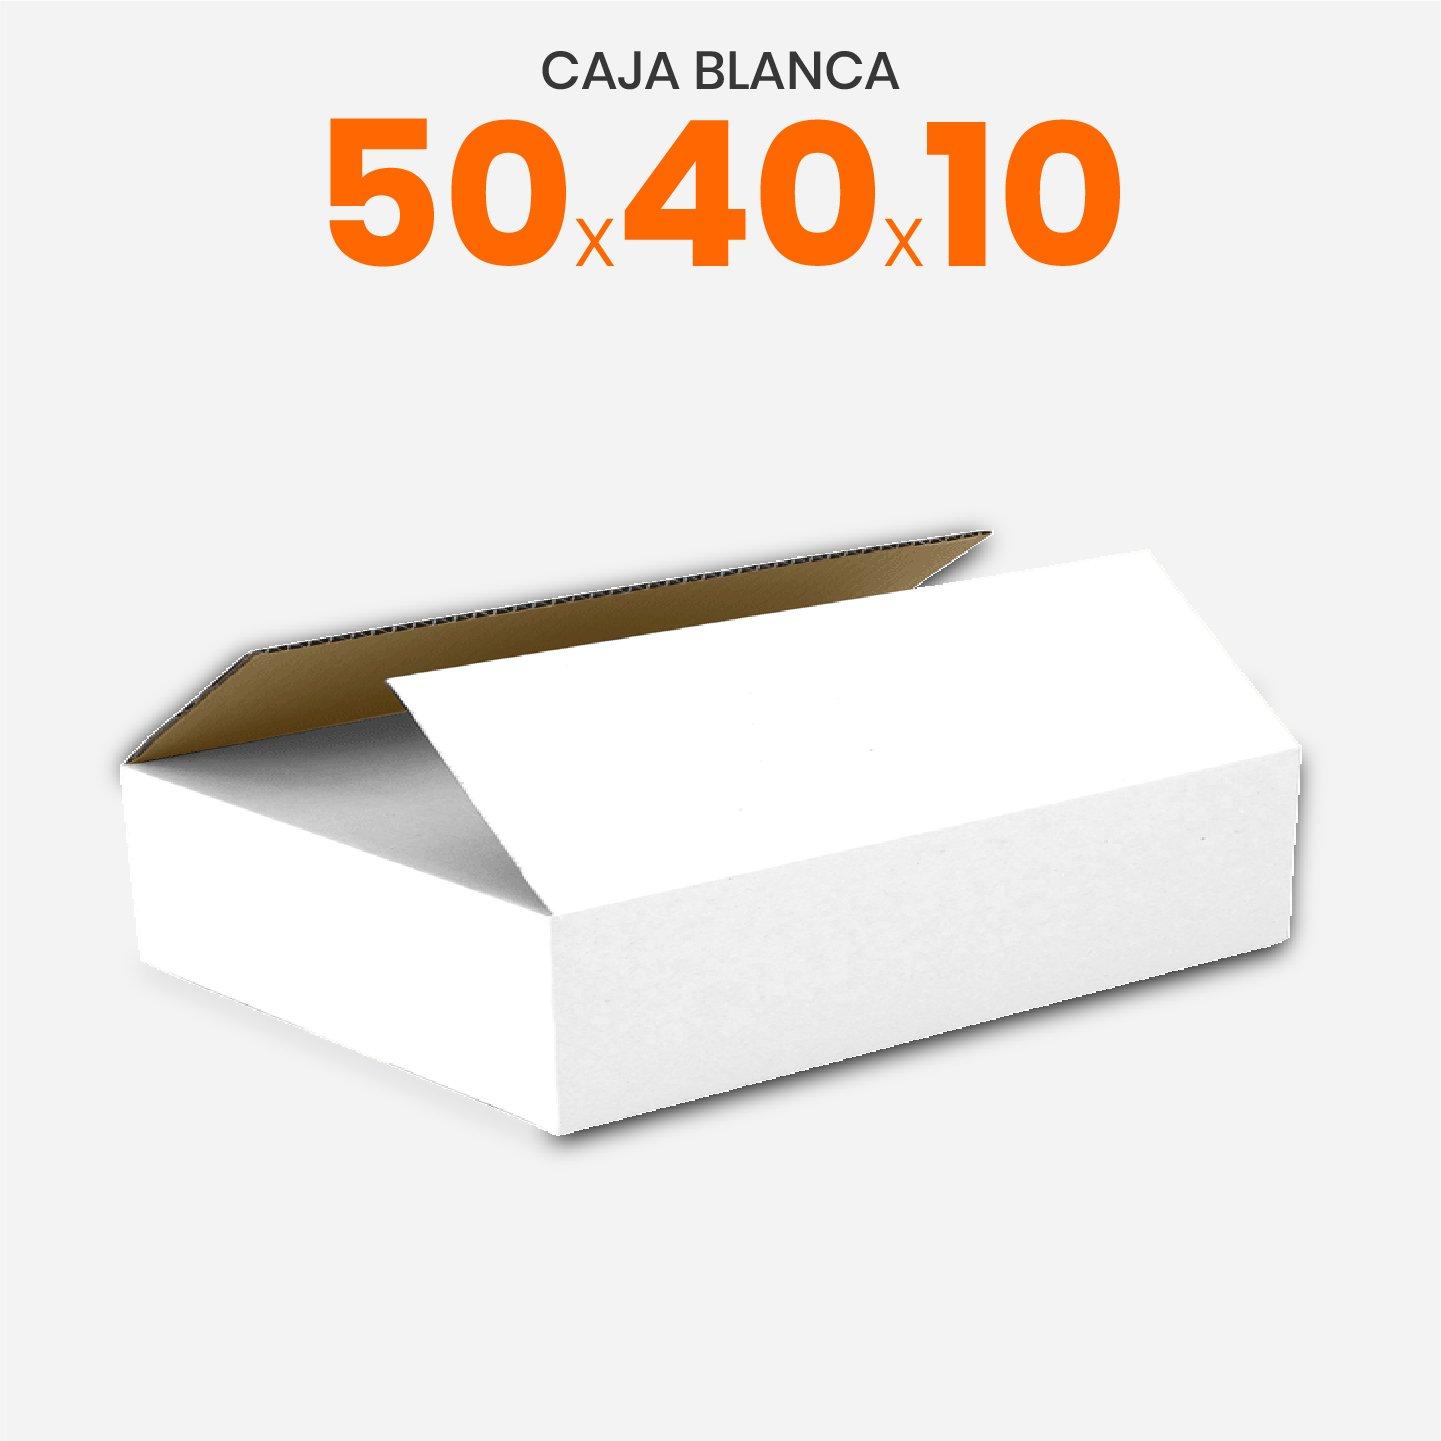 Caja De Cartón Corrugado Blanca 50x40x10